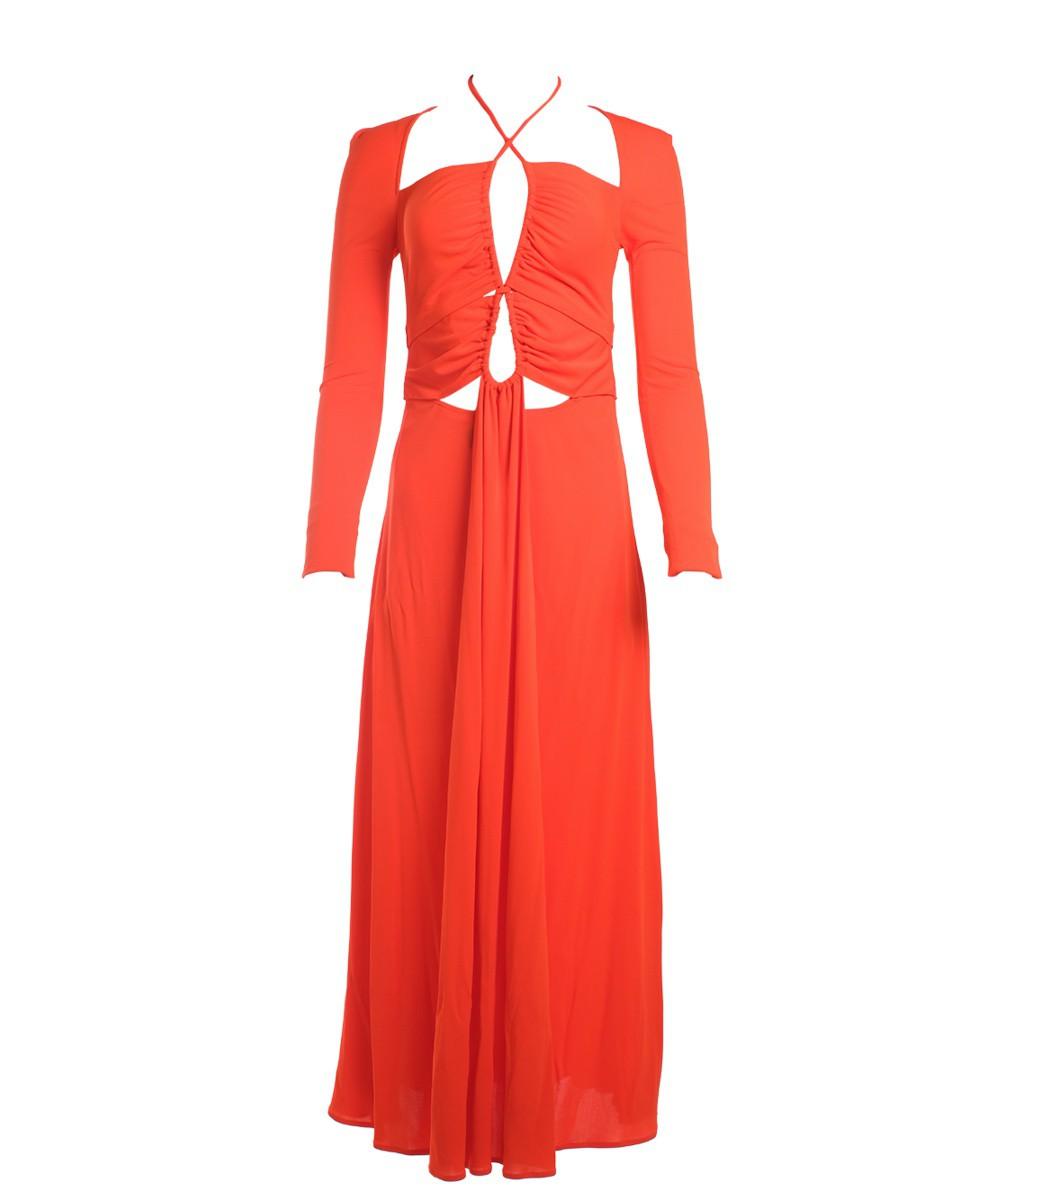 Proenza Schouler Cut-out Maxi Dress